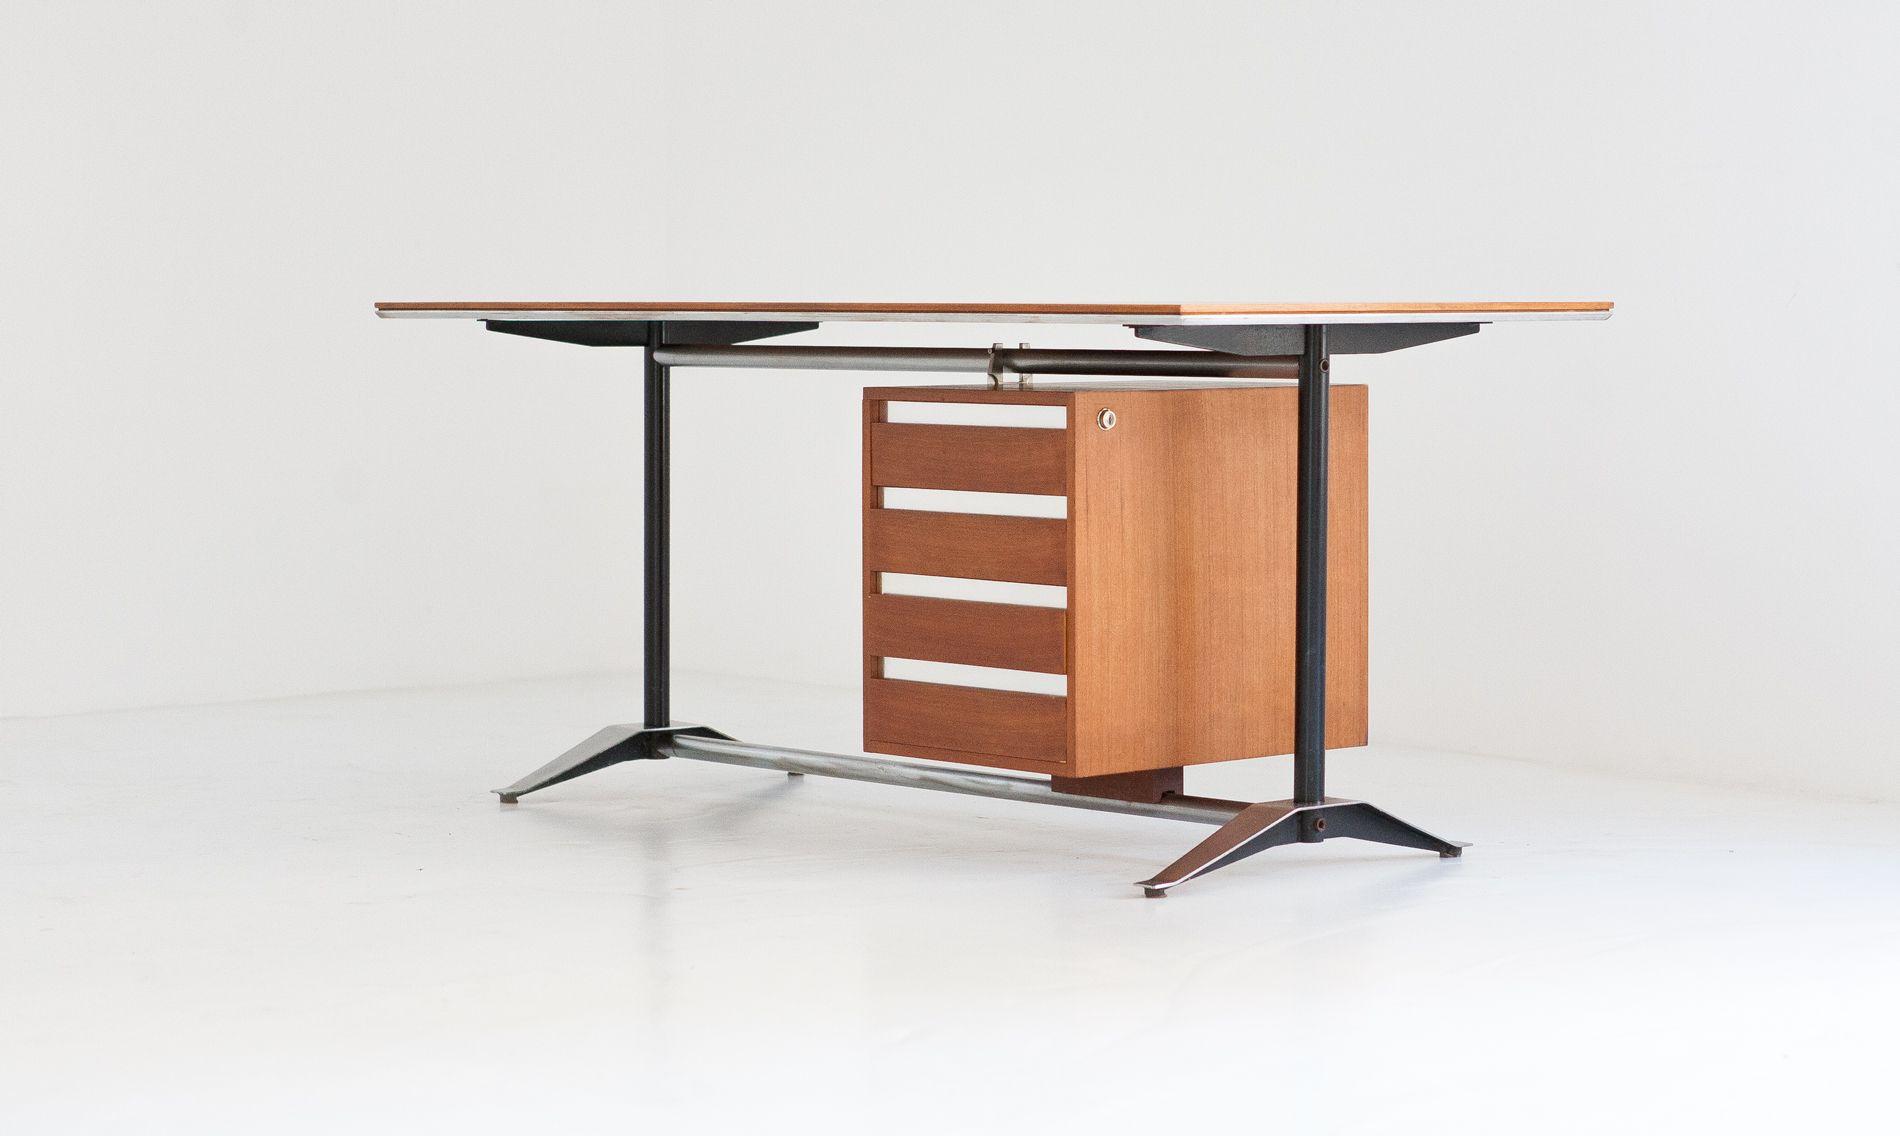 Mid Century Italian Teak Desk by Alberto Rosselli & Gio Ponti for